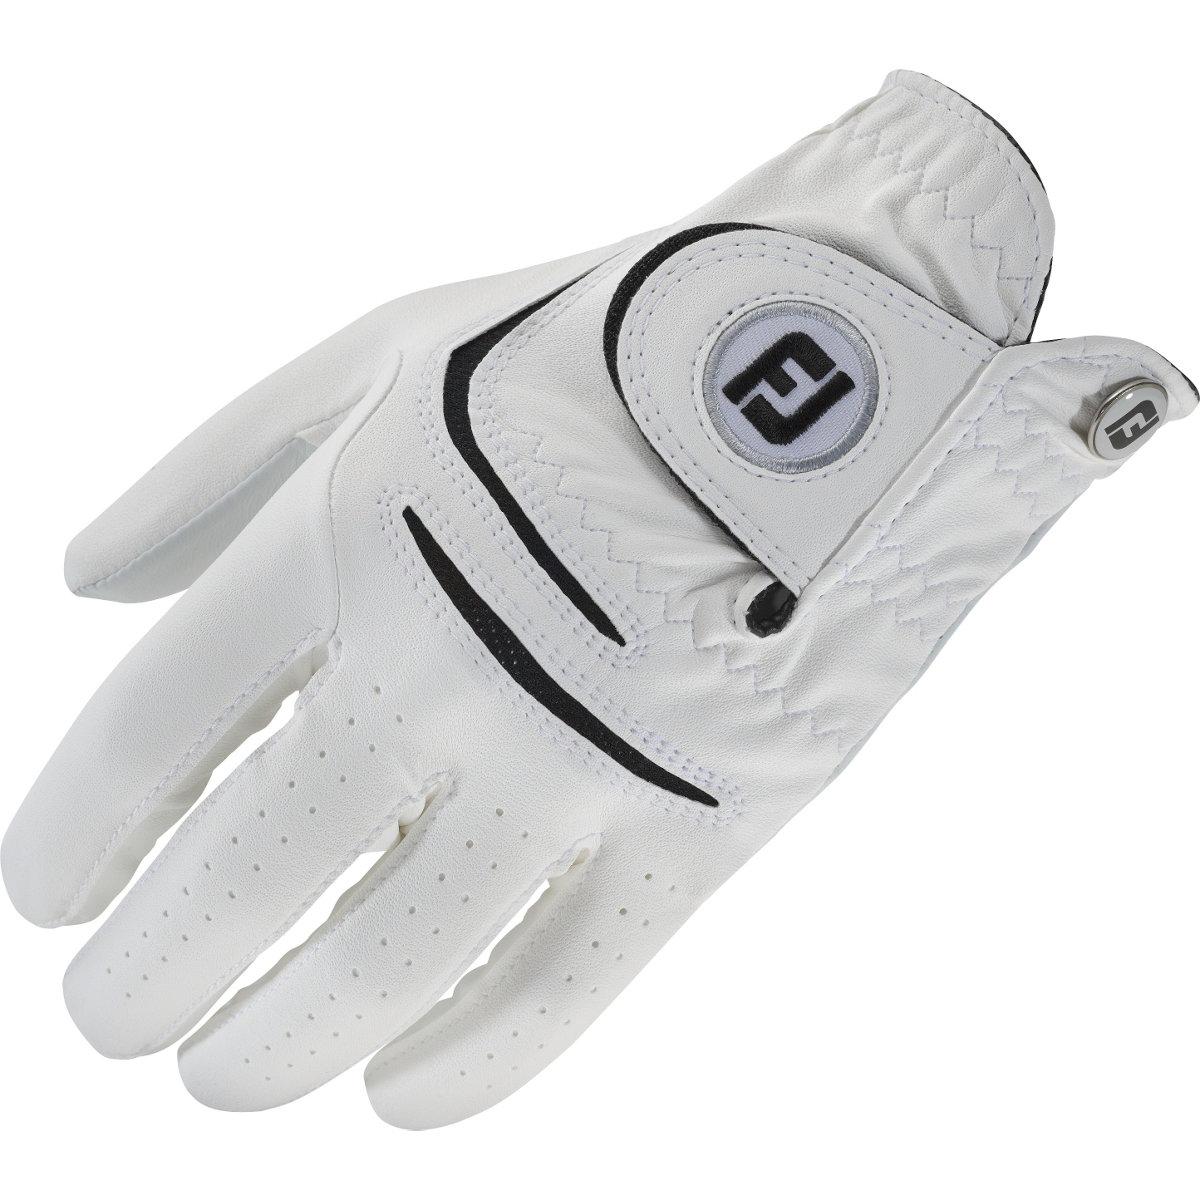 Mens golf gloves xxl -  Puma Golf Glove Xxl